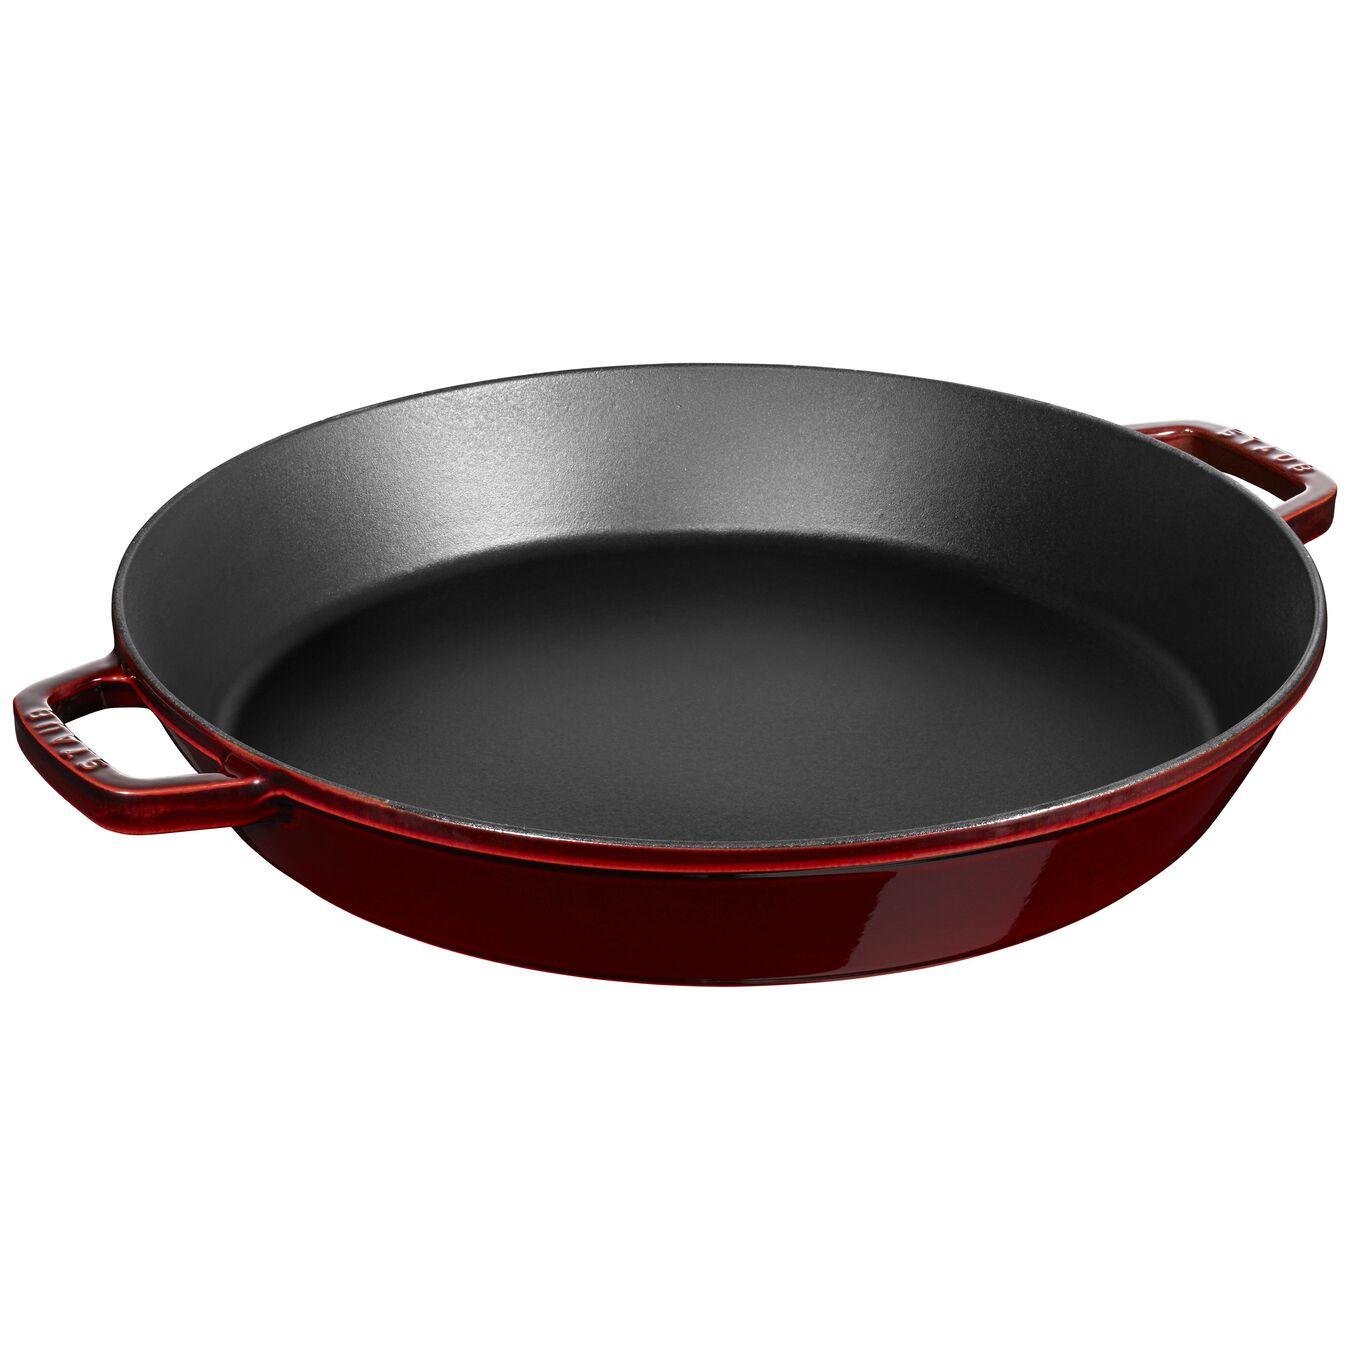 15-inch Double Handle Fry Pan / Paella Pan - Grenadine,,large 1